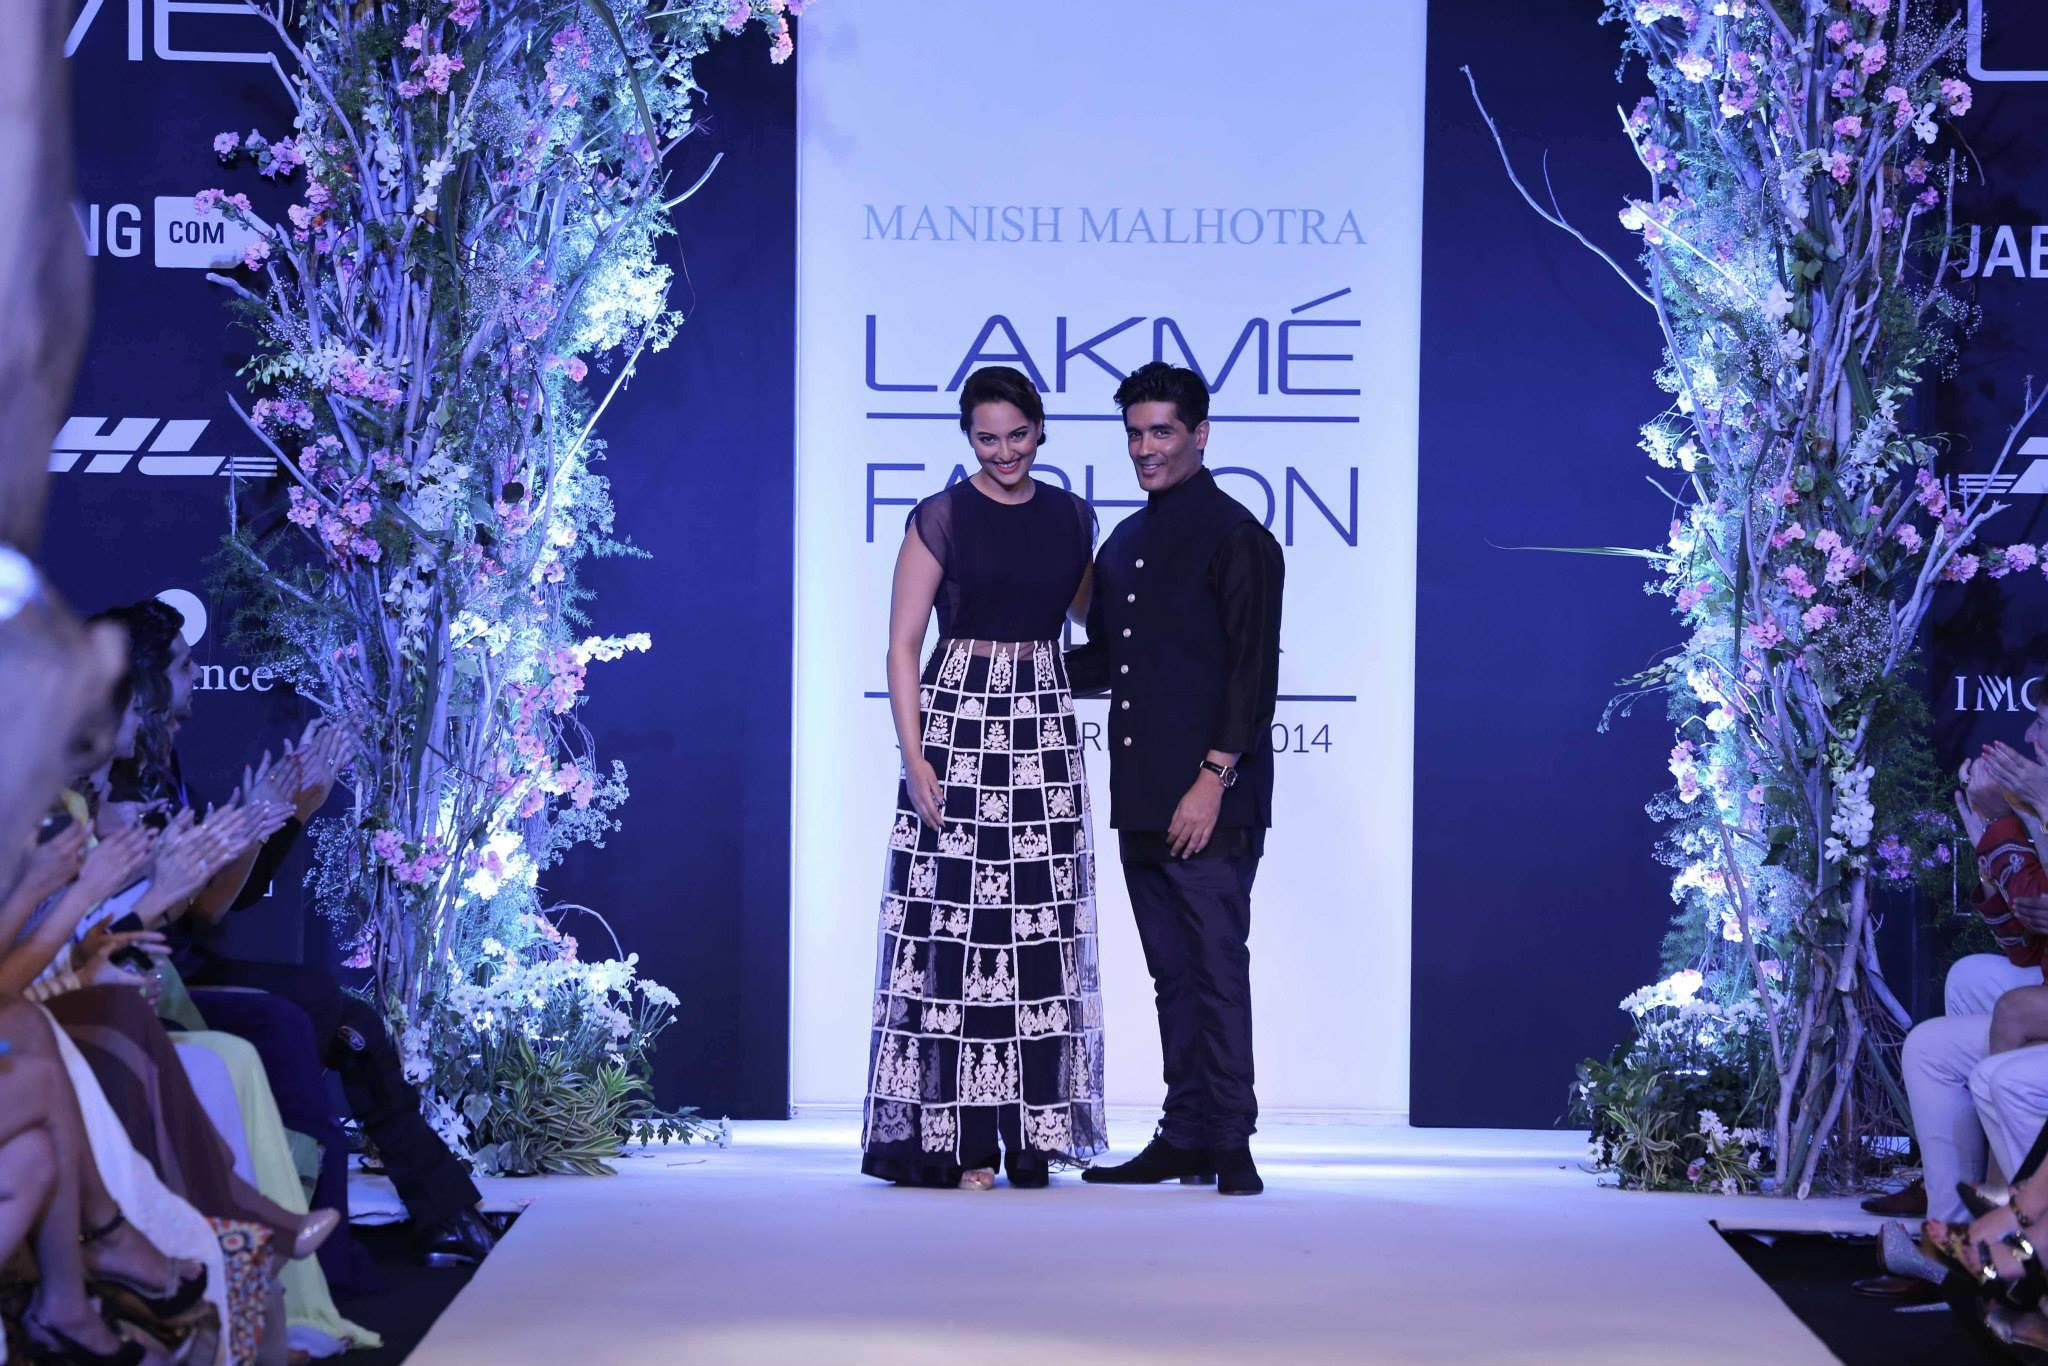 Manish Malhotra at Lakme Fashion Week Summer Resort 2014